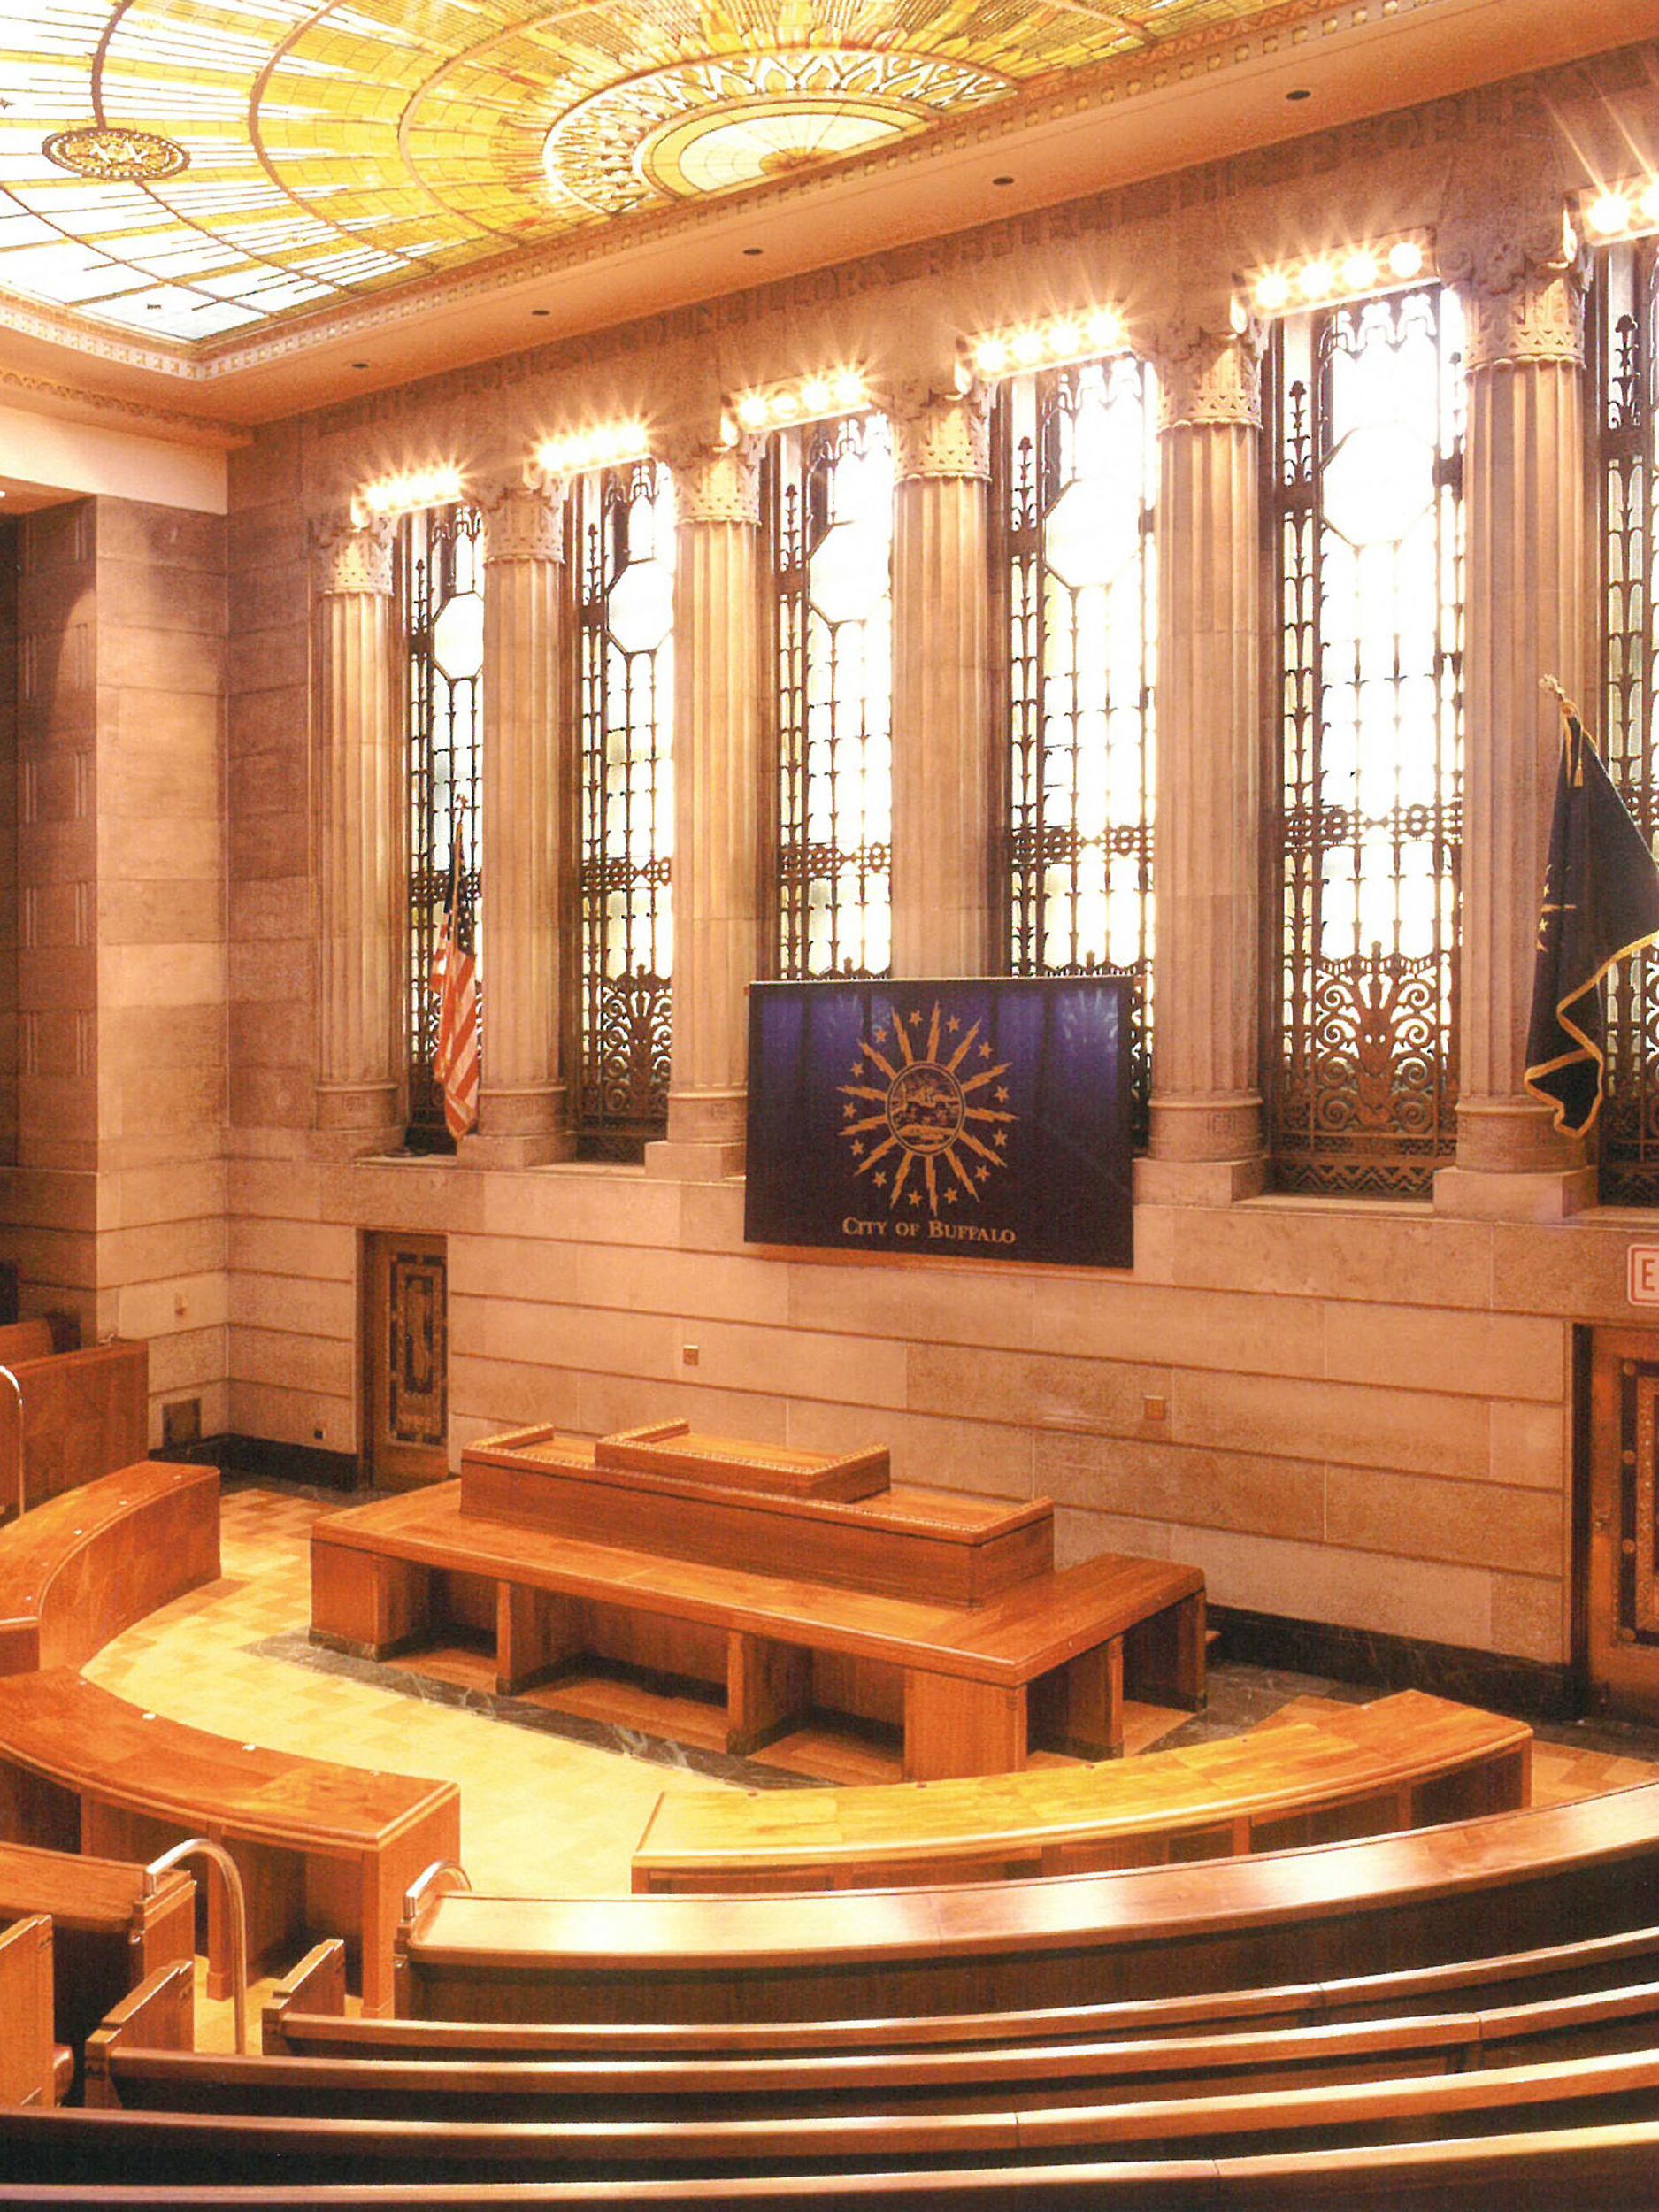 Buffalo City Hall Common Council Chambers Restoration